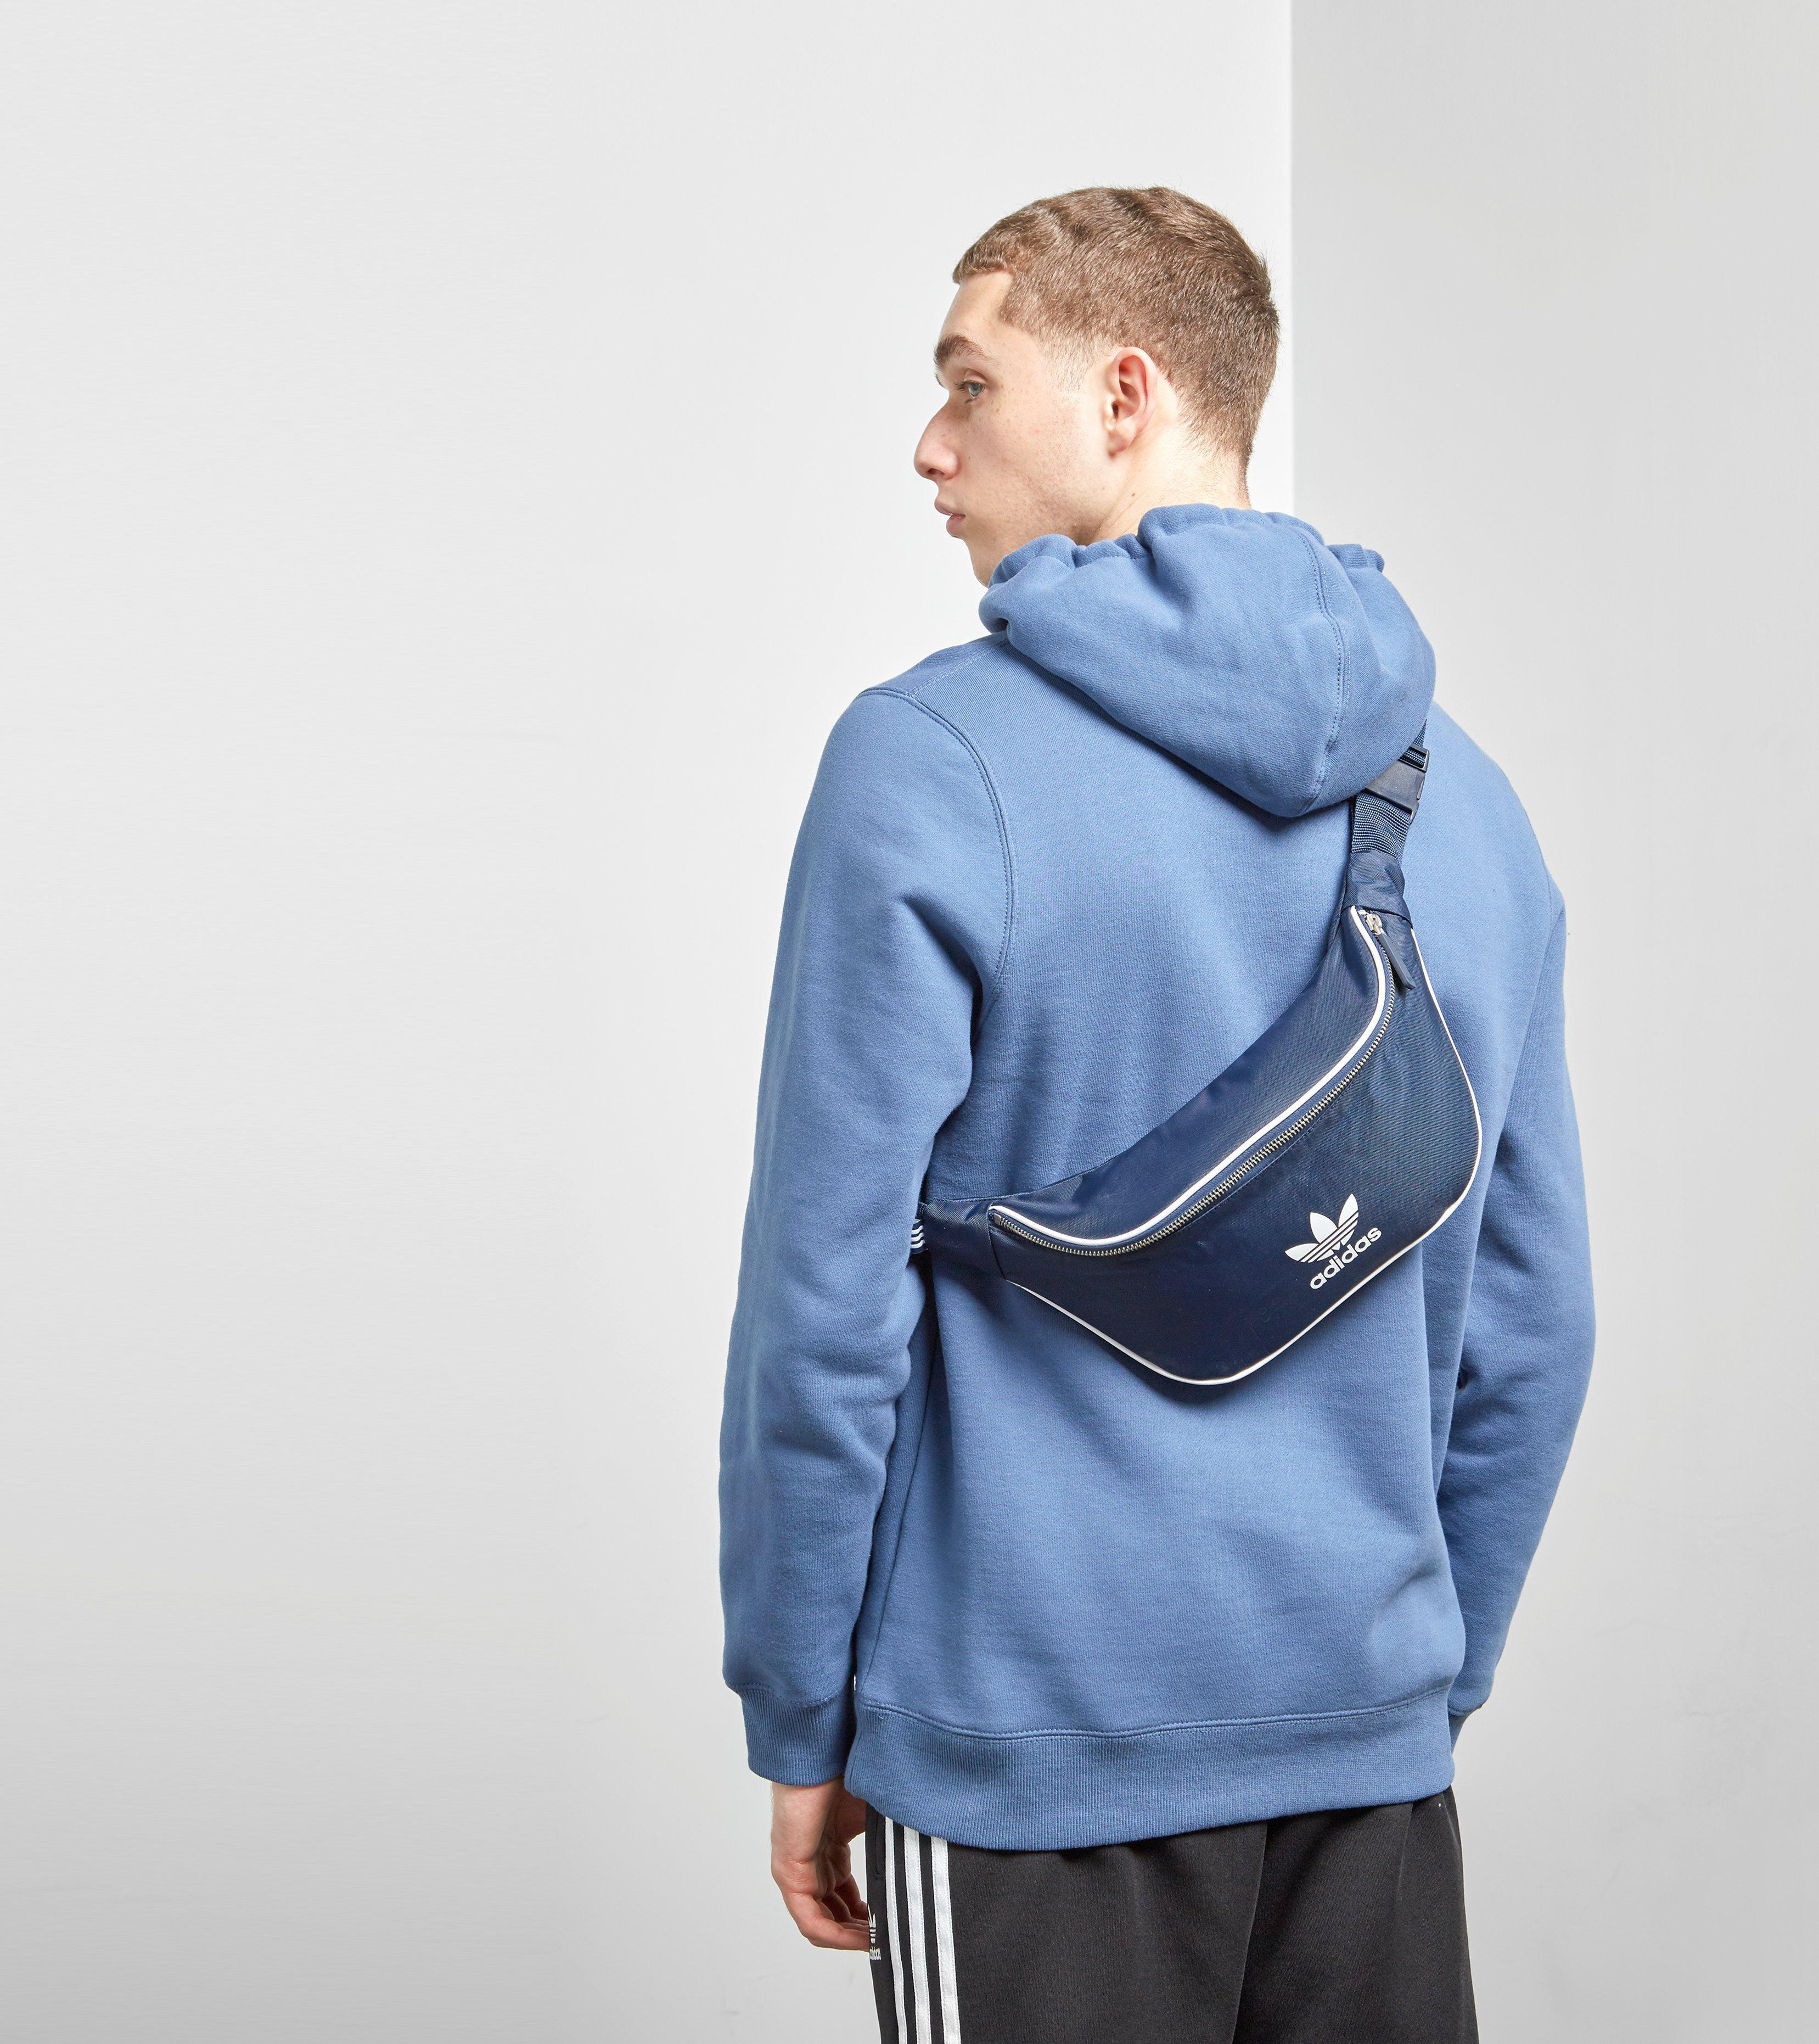 Lyst - adidas Originals Waist Bag in Blue for Men 2eaa01a1efbf3